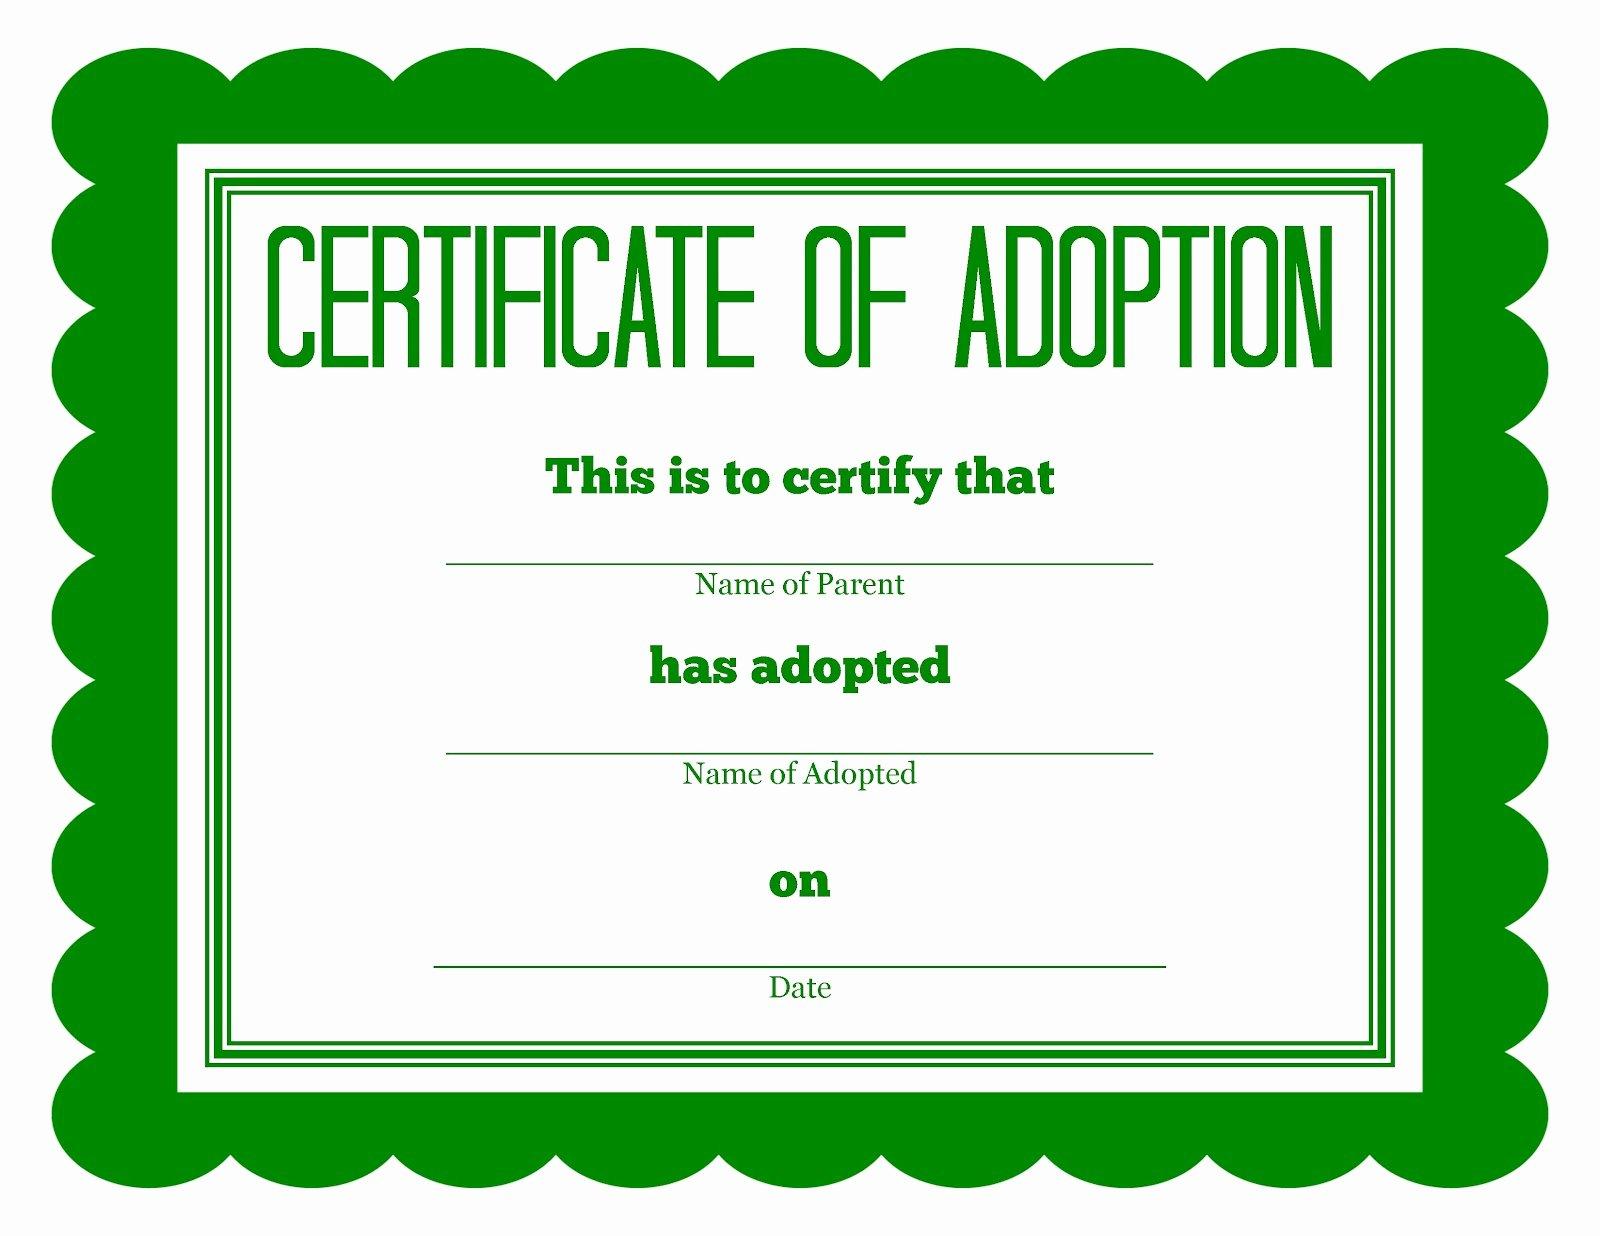 Stuffed Animal Adoption Certificate Template Fresh More Stuffed Animal Adoption Certificates